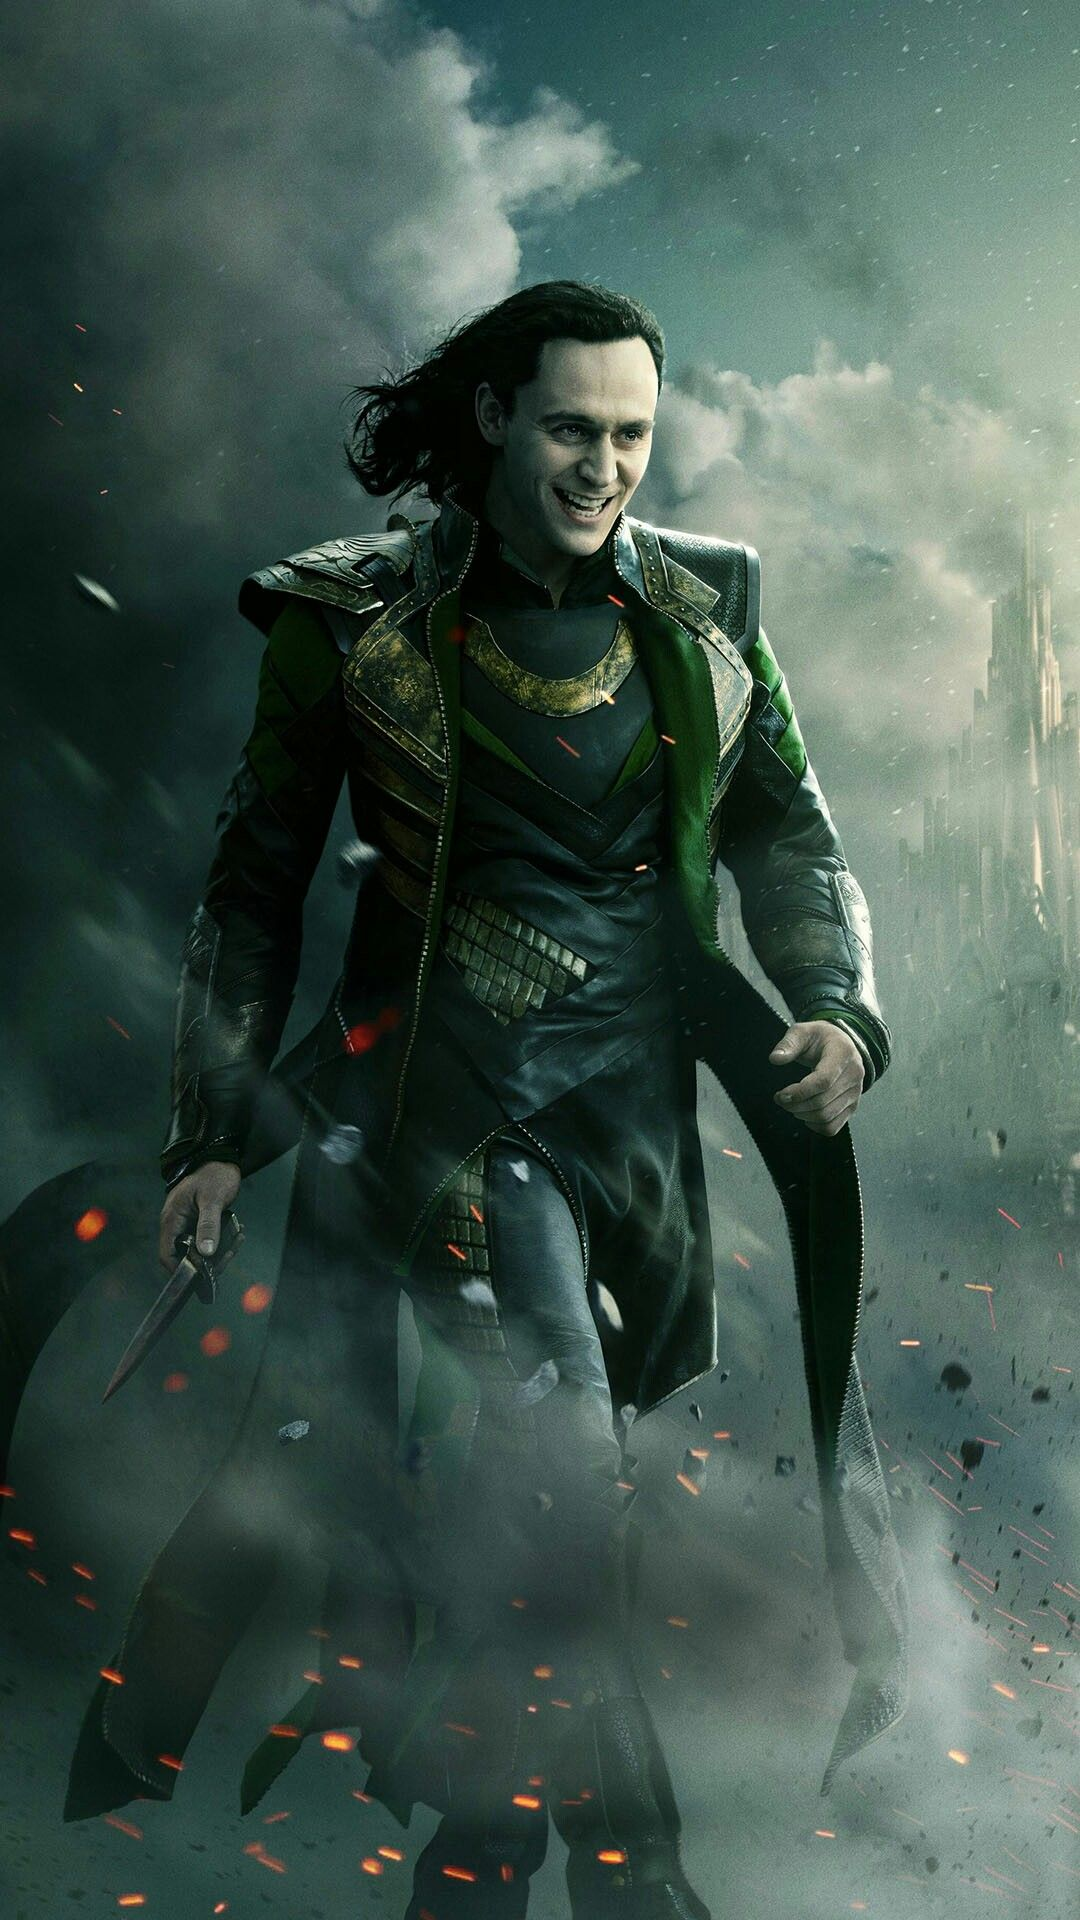 Loki Wallpaper Thor The Dark World Loki Poster Loki Wallpaper